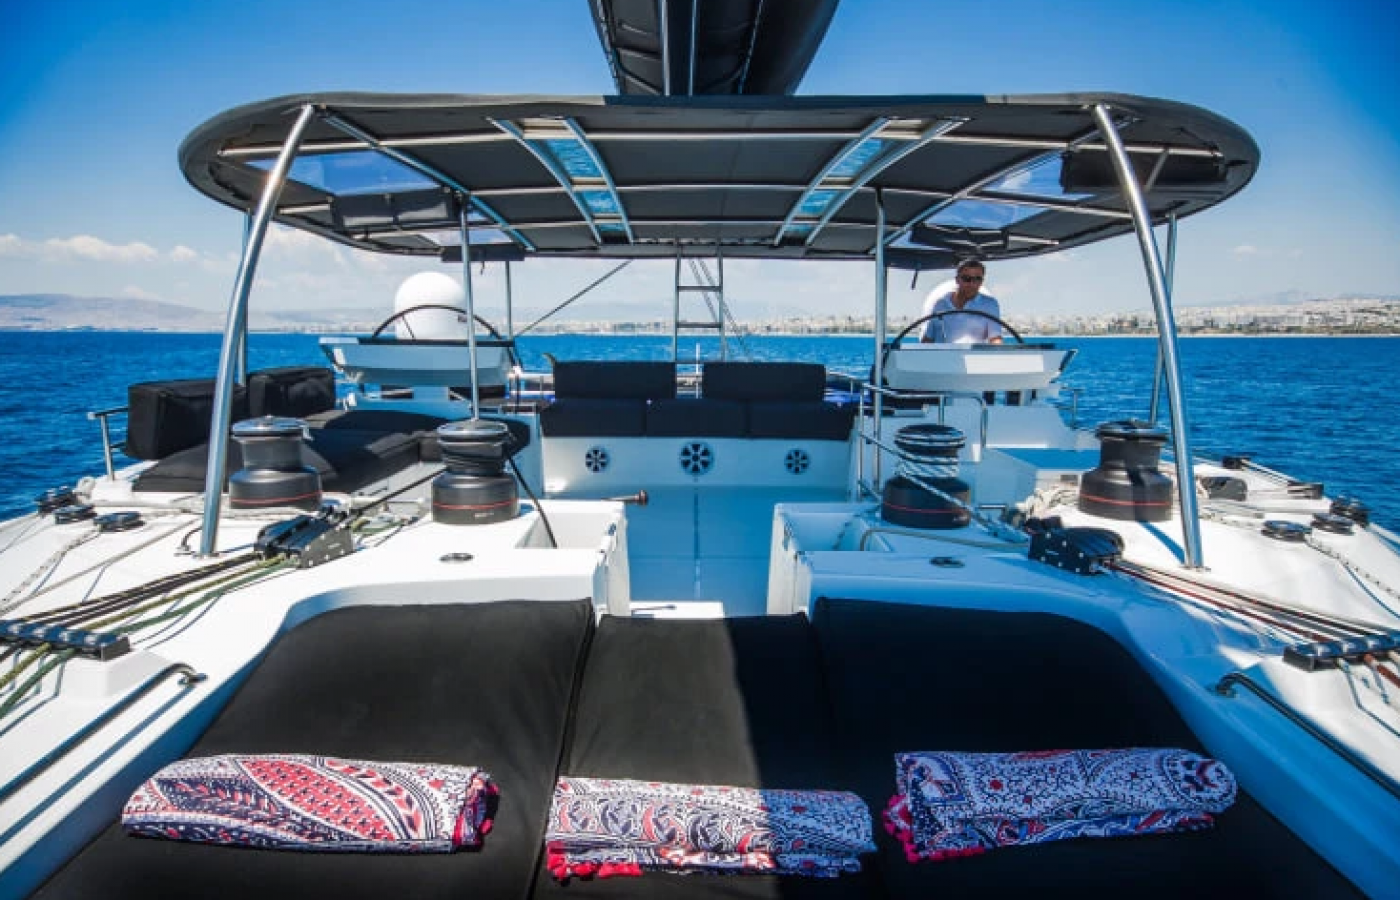 Black sunbathing cushions on board the Lagoon 620